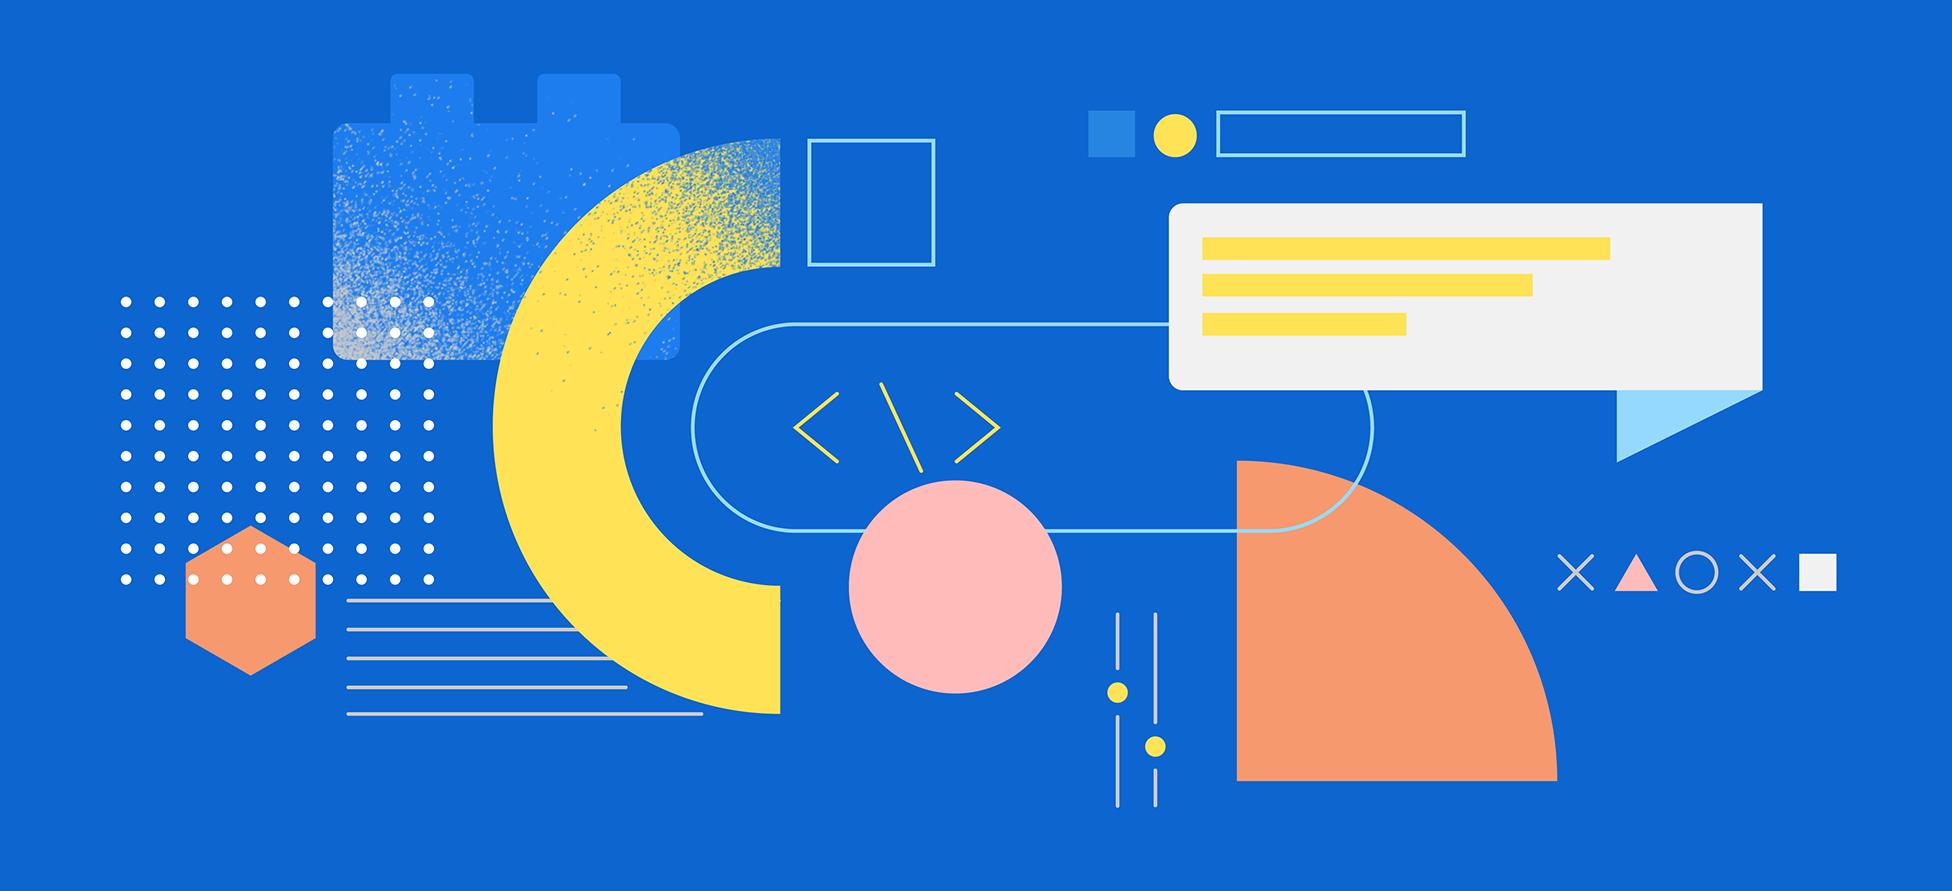 Spectrum Web Tool From Adobe In 2020 Web Design Tools Website Illustration News Web Design